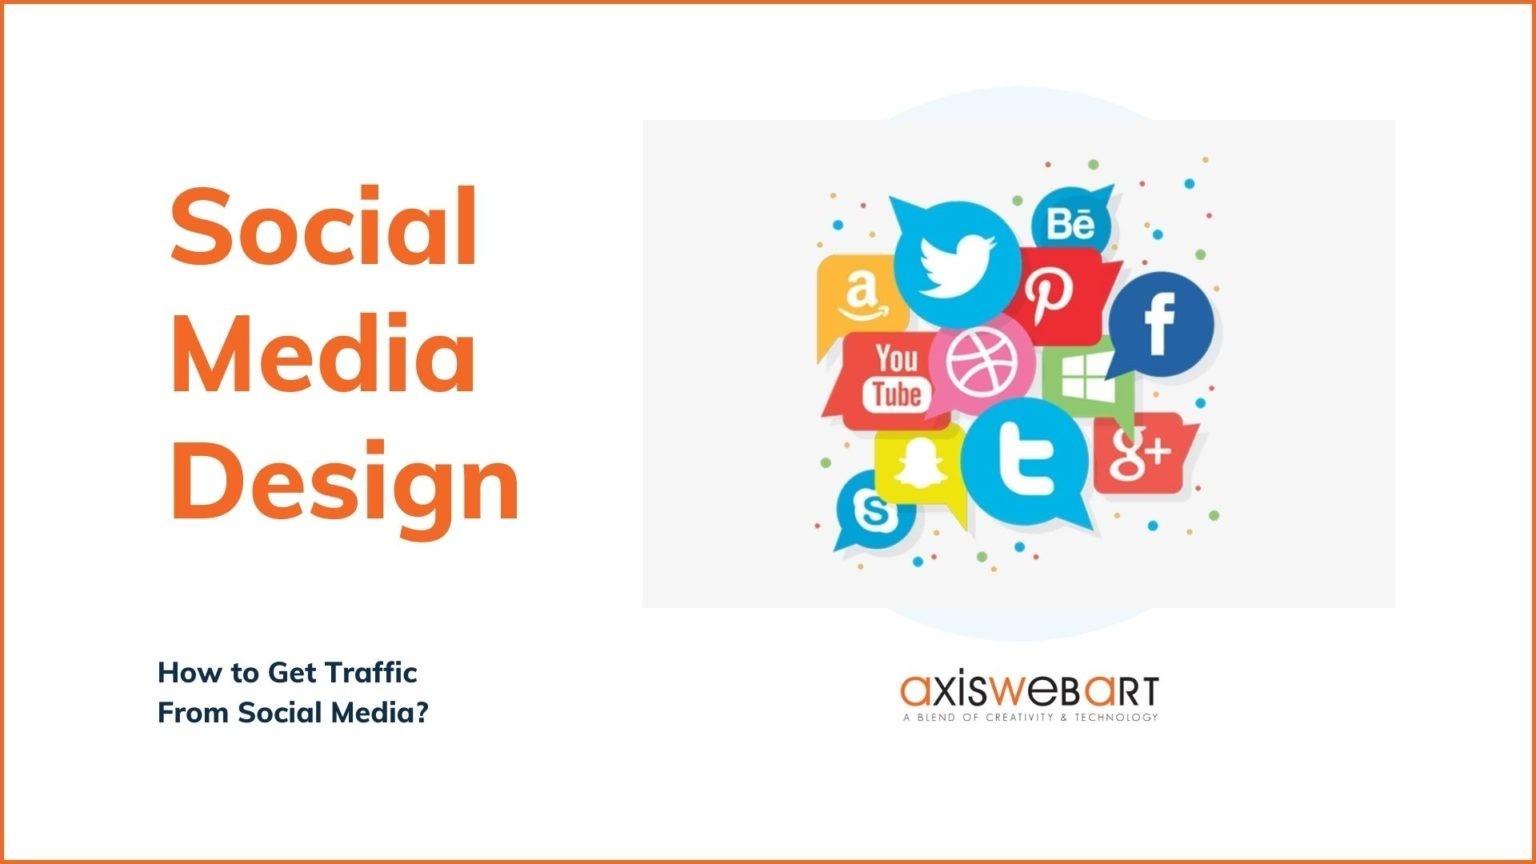 Social Media Design guide